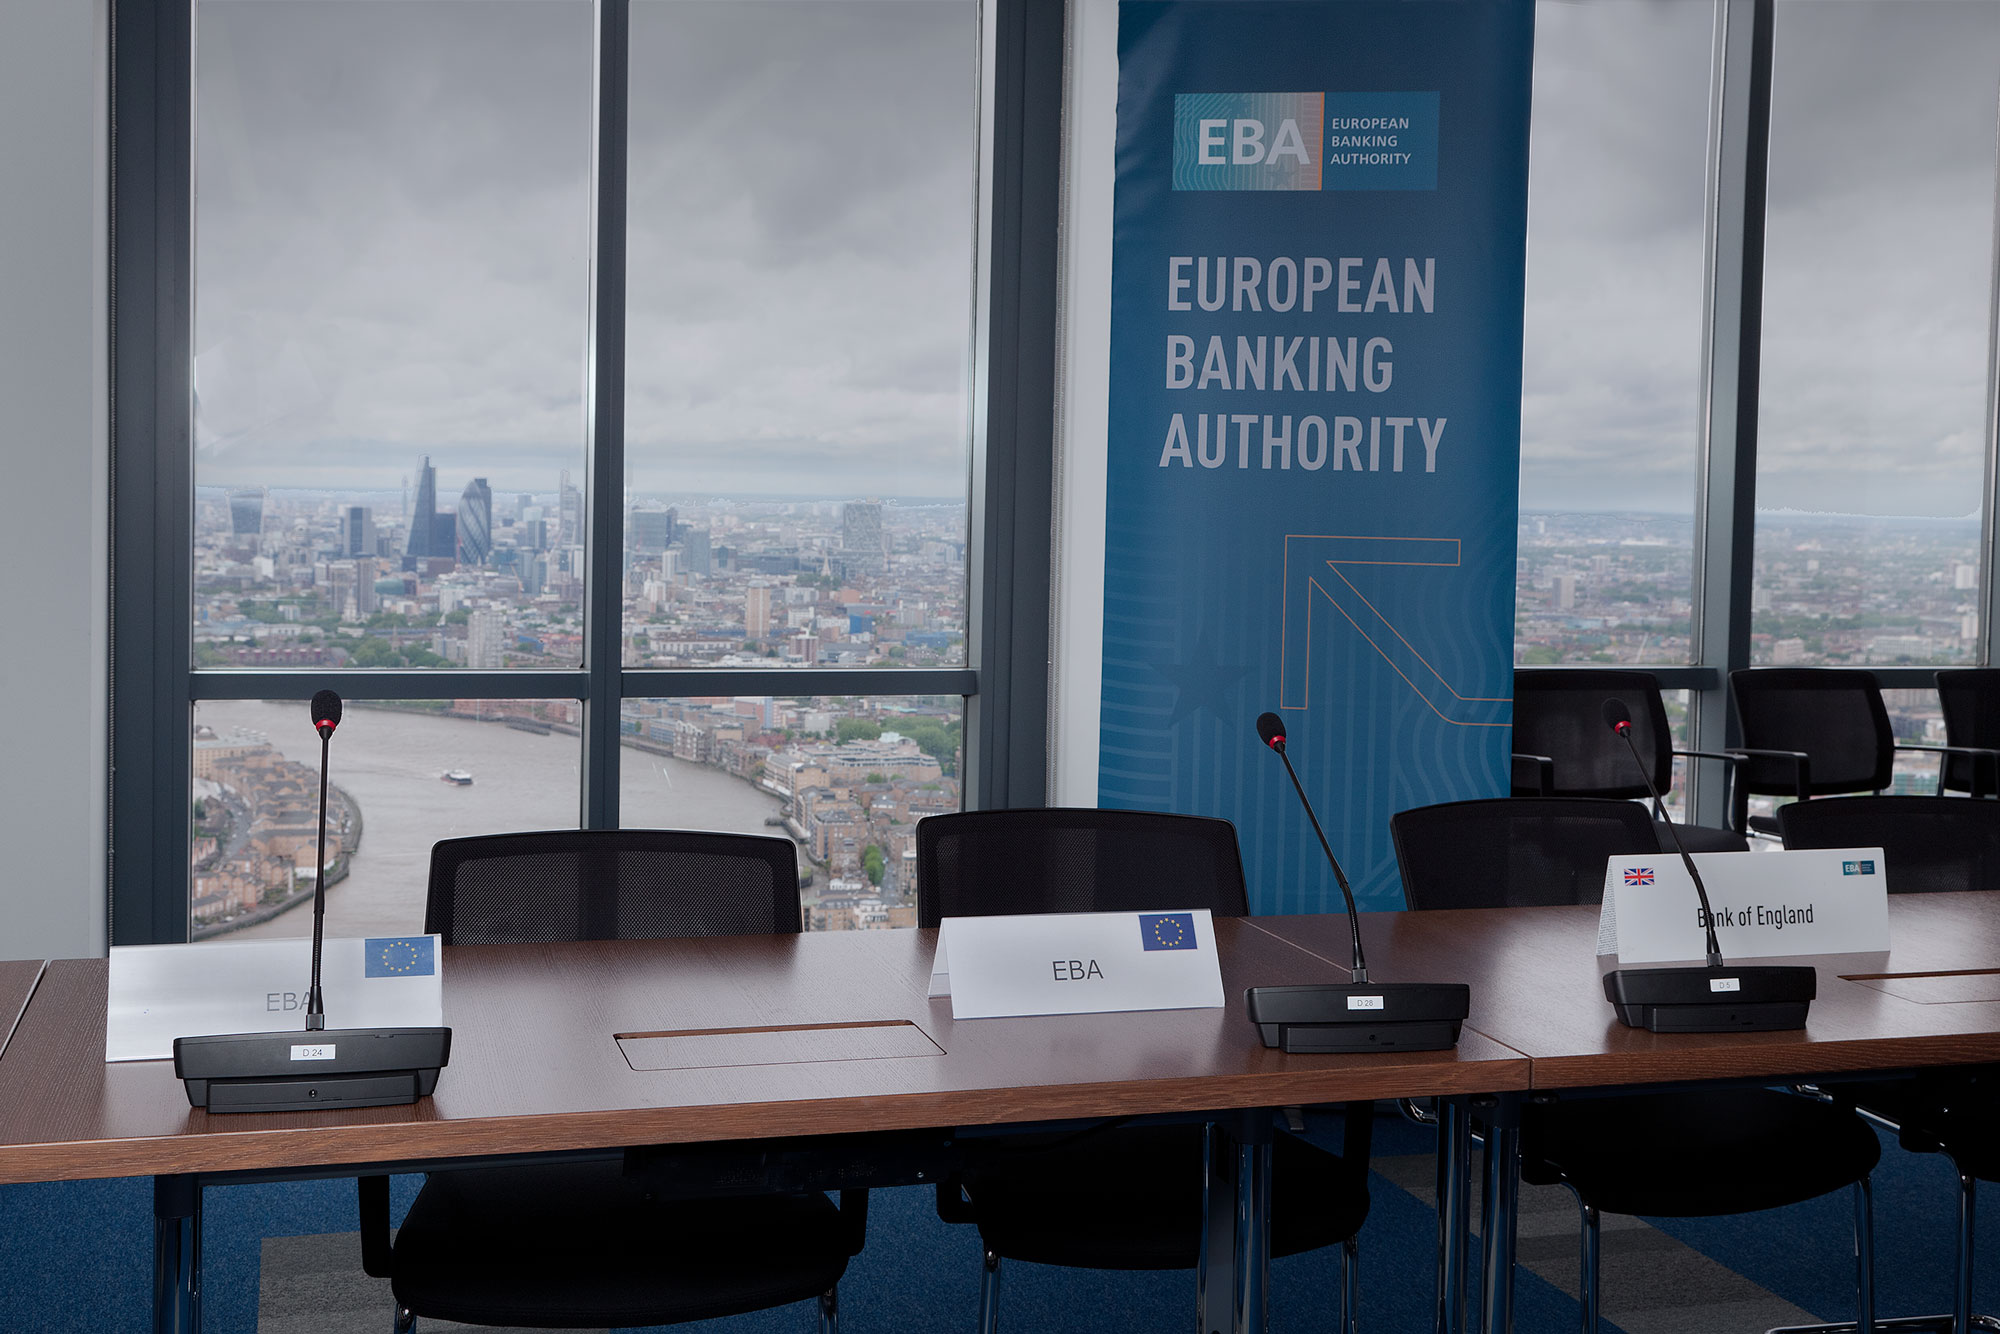 eba-corporate-pic-4-jpg